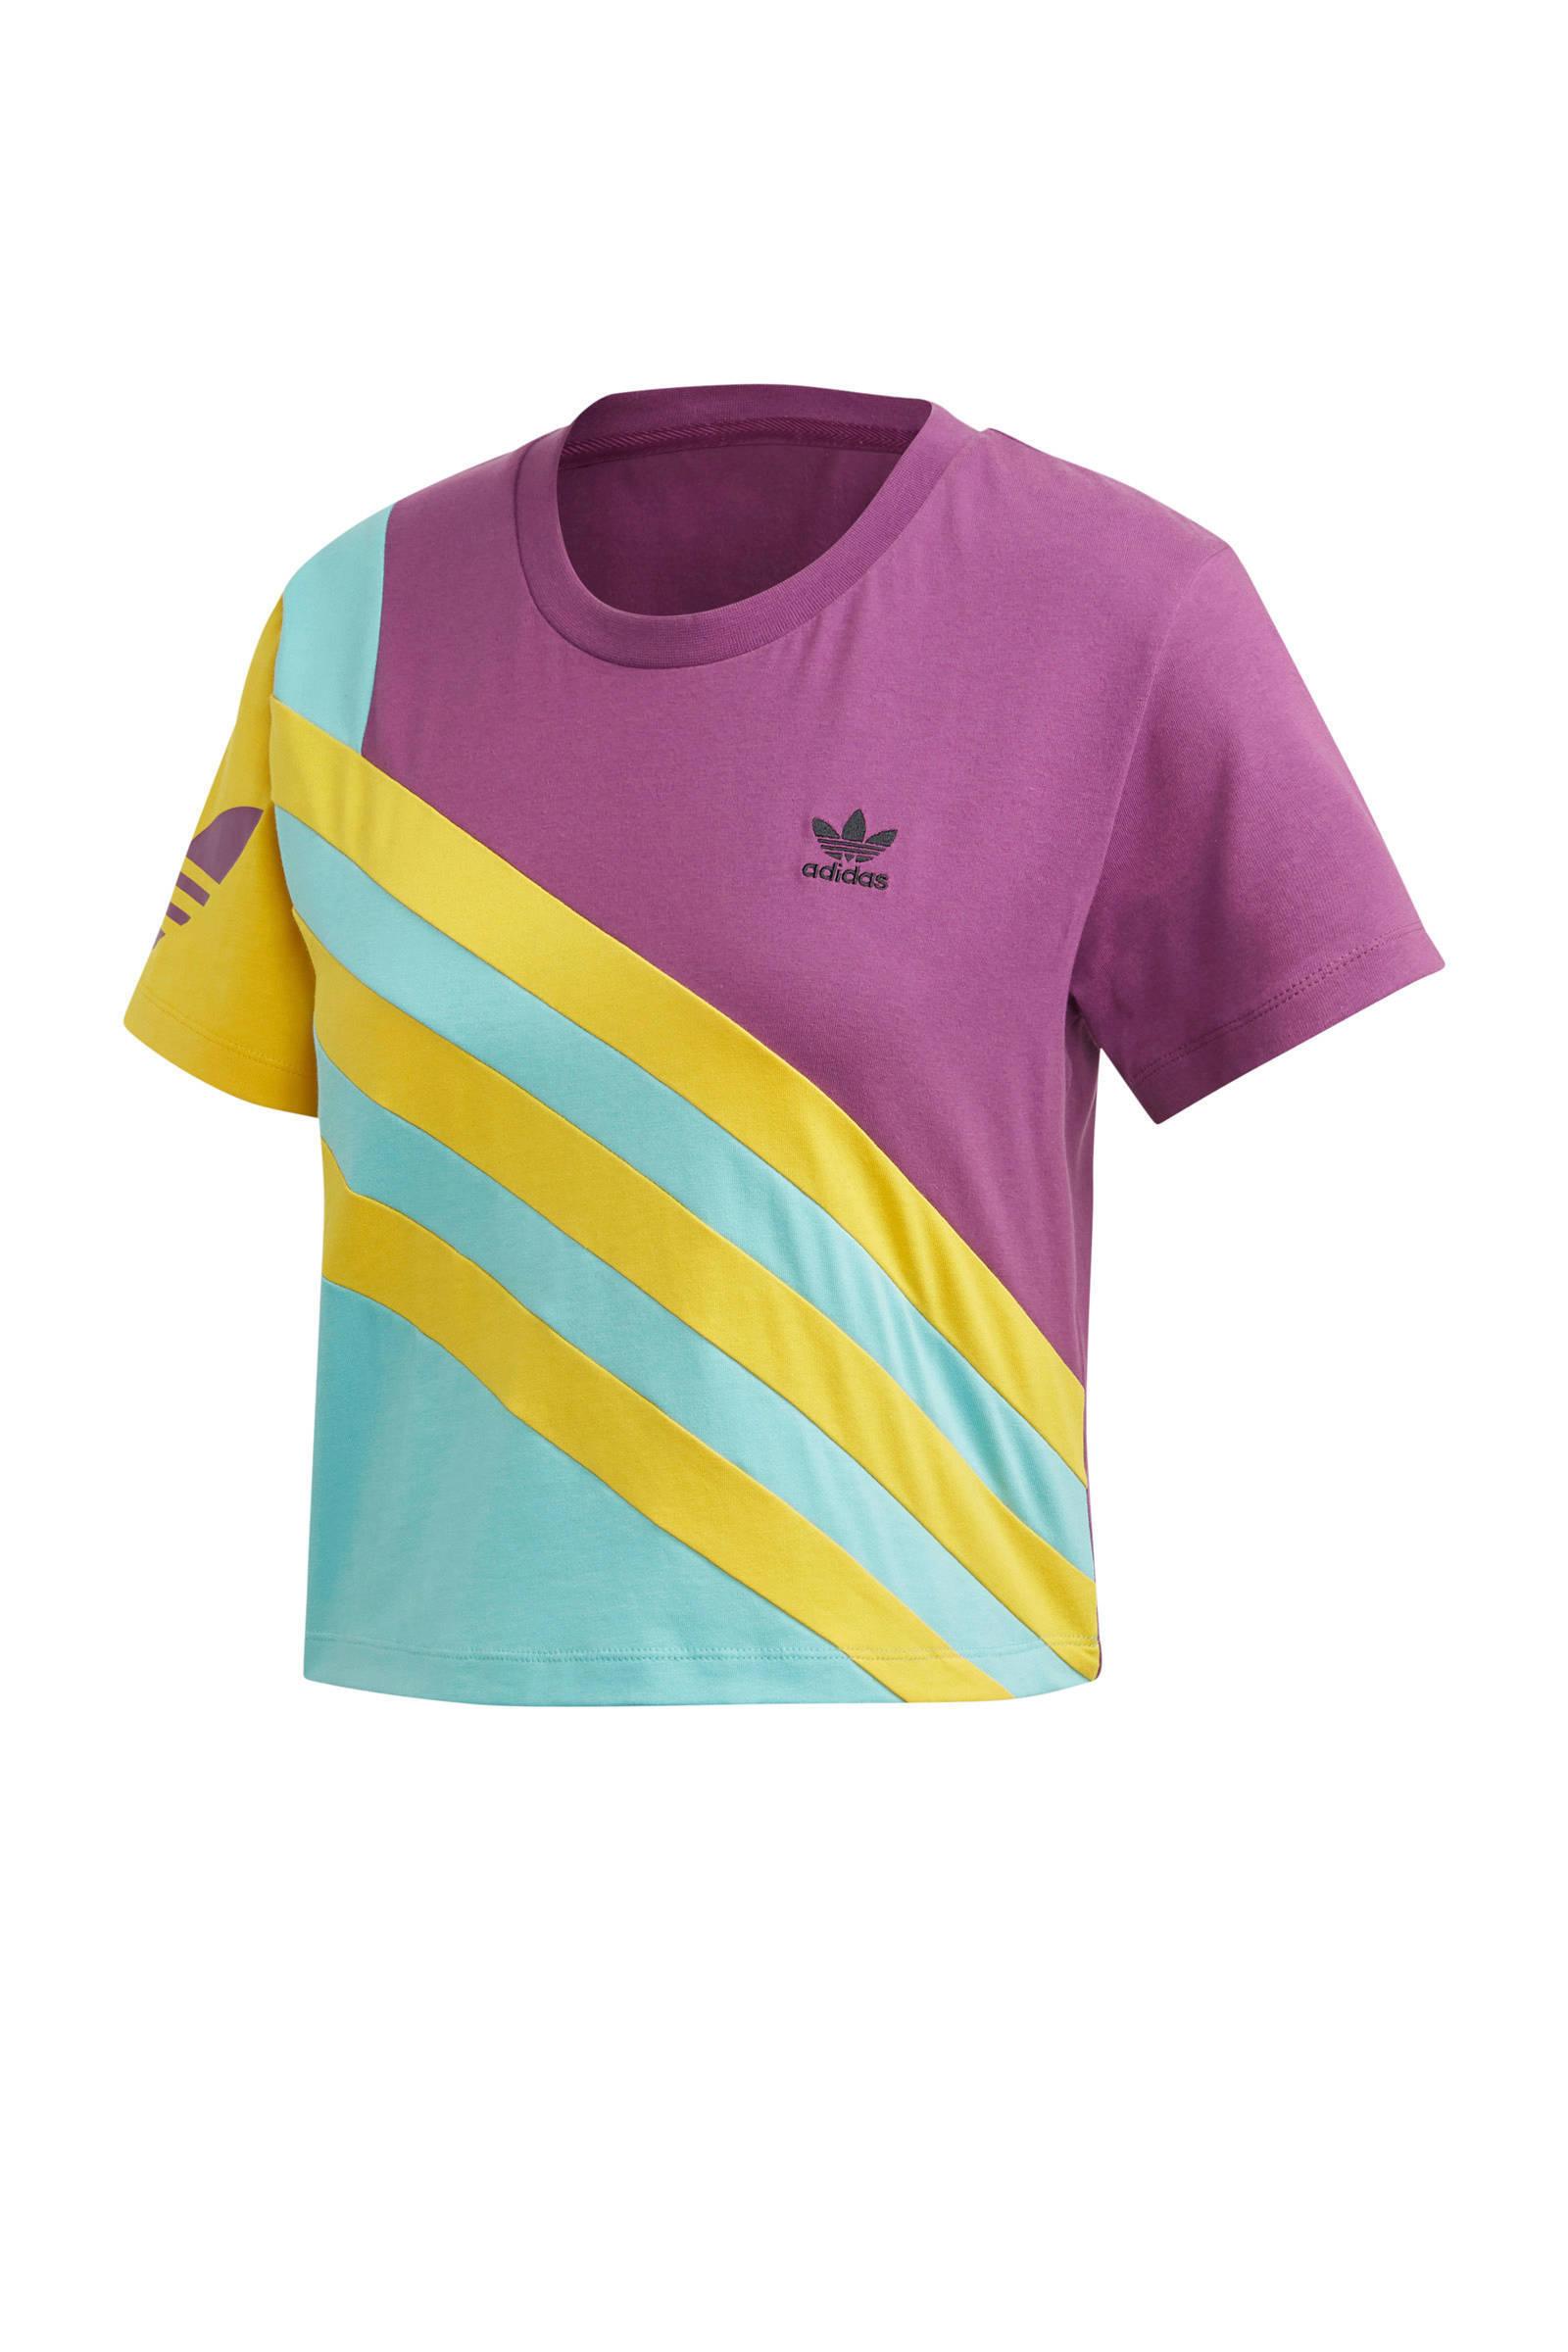 adidas Originals cropped T-shirt paars/geel/blauw | wehkamp